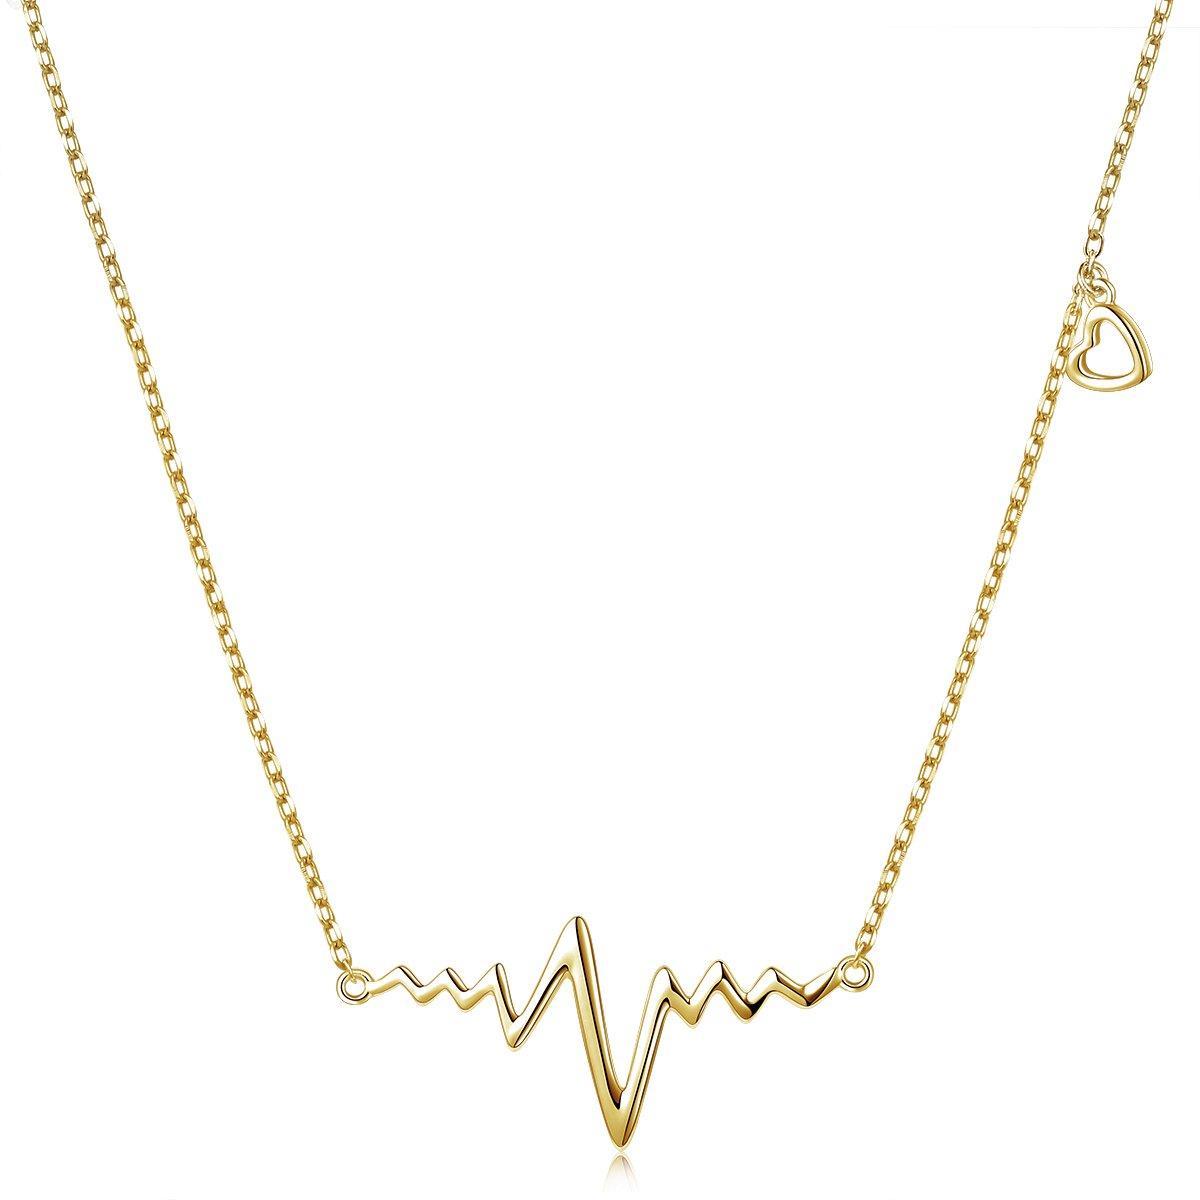 LINLIN FINE JEWELRY Heartbeat Necklace 925 Sterling Silver Infinity Love Cute Life Line Heart EKG Heartbeat Necklace Gift for Women Girls,18'' (Gold)